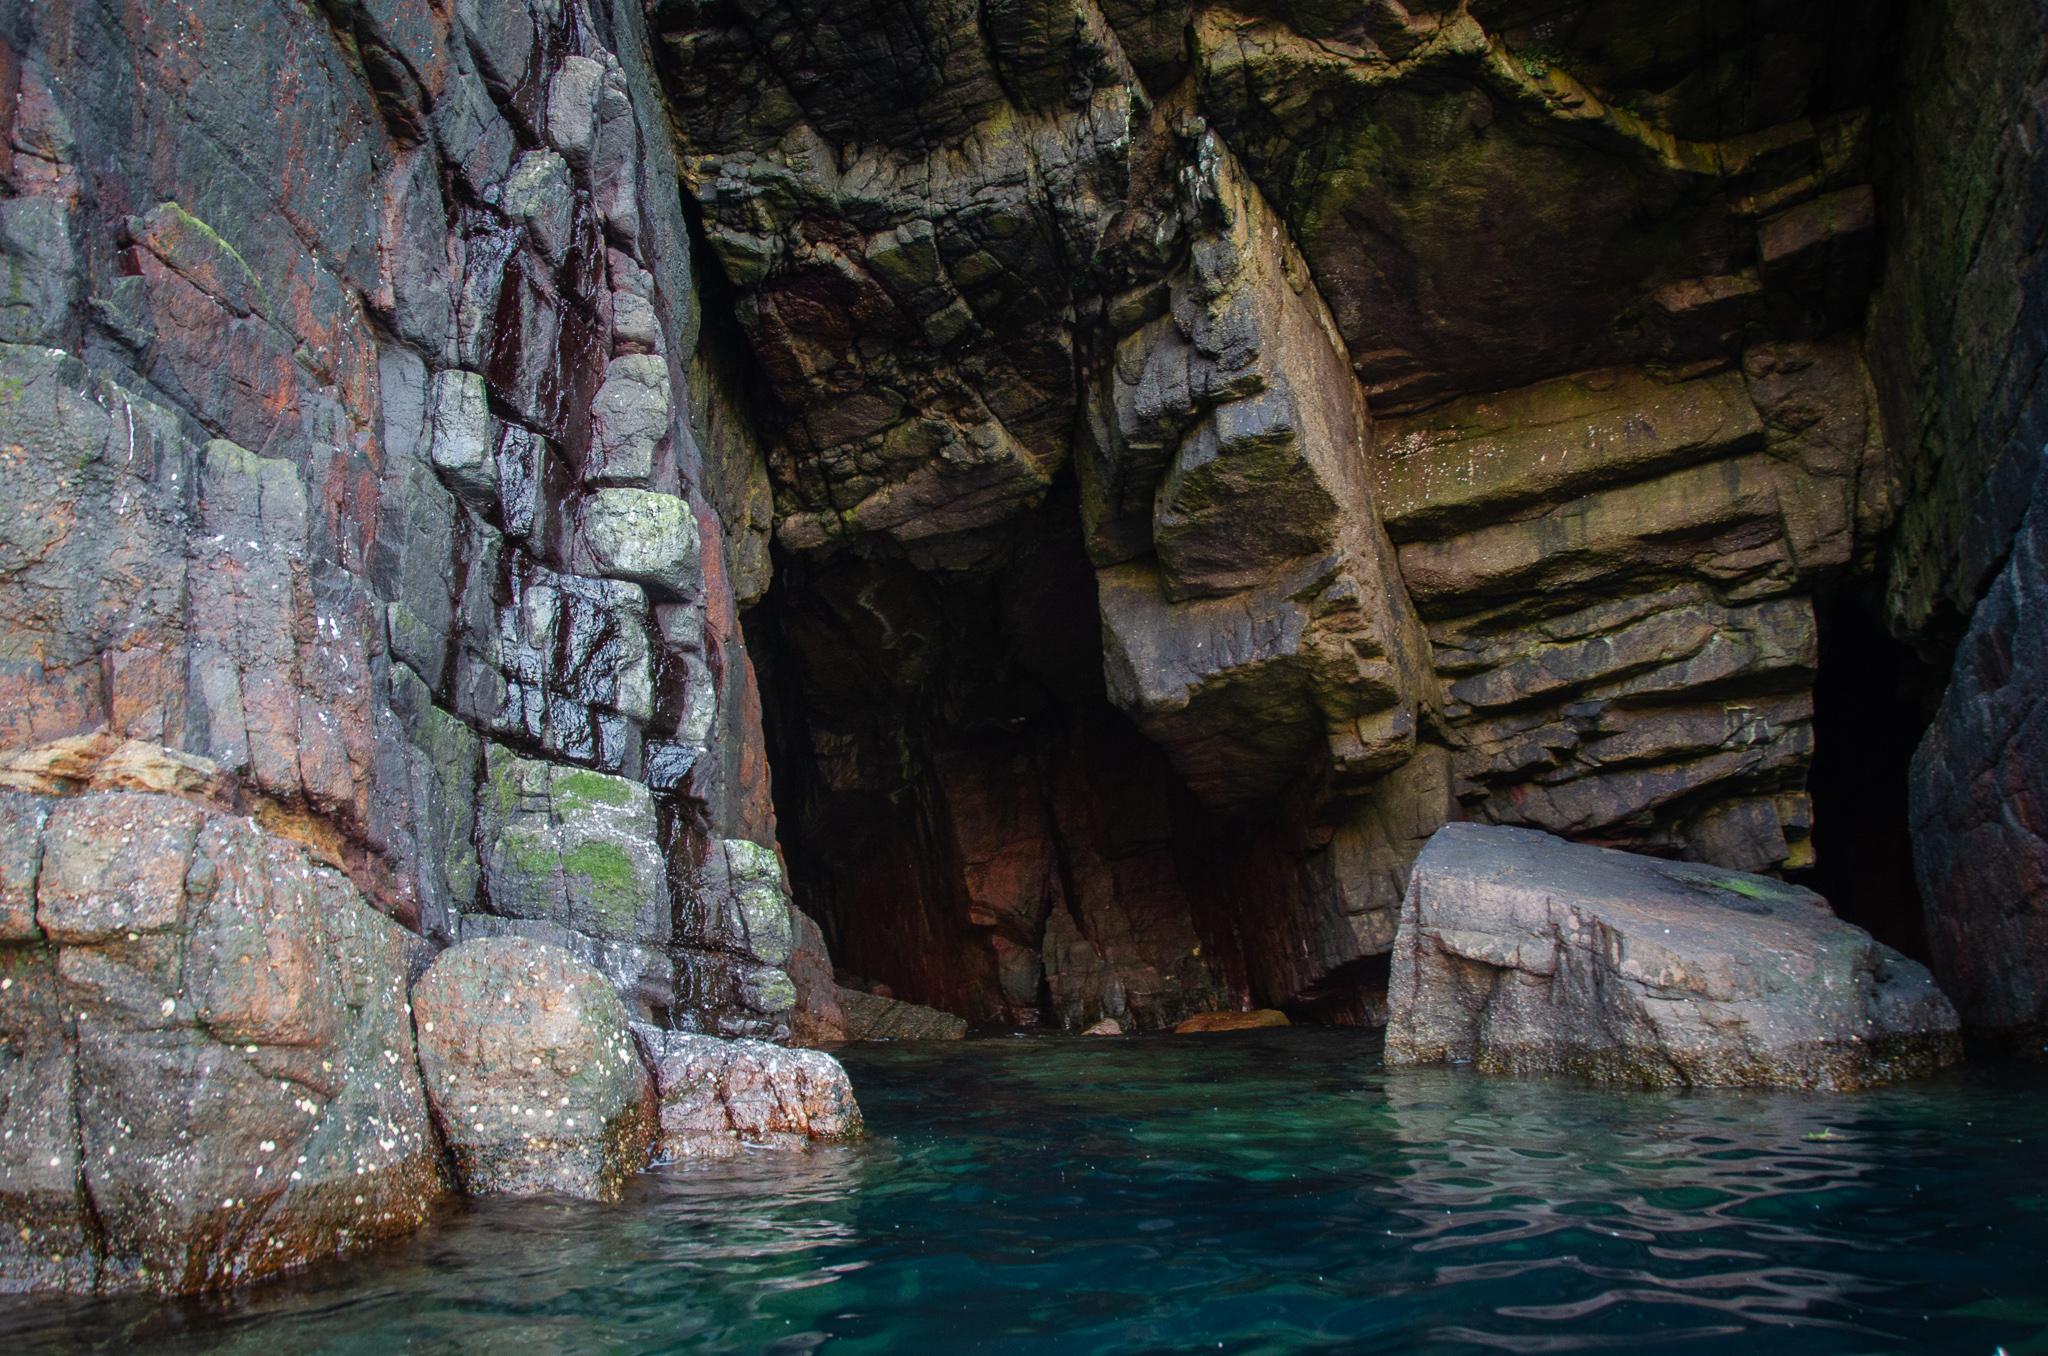 Handa Island's hidden inlets